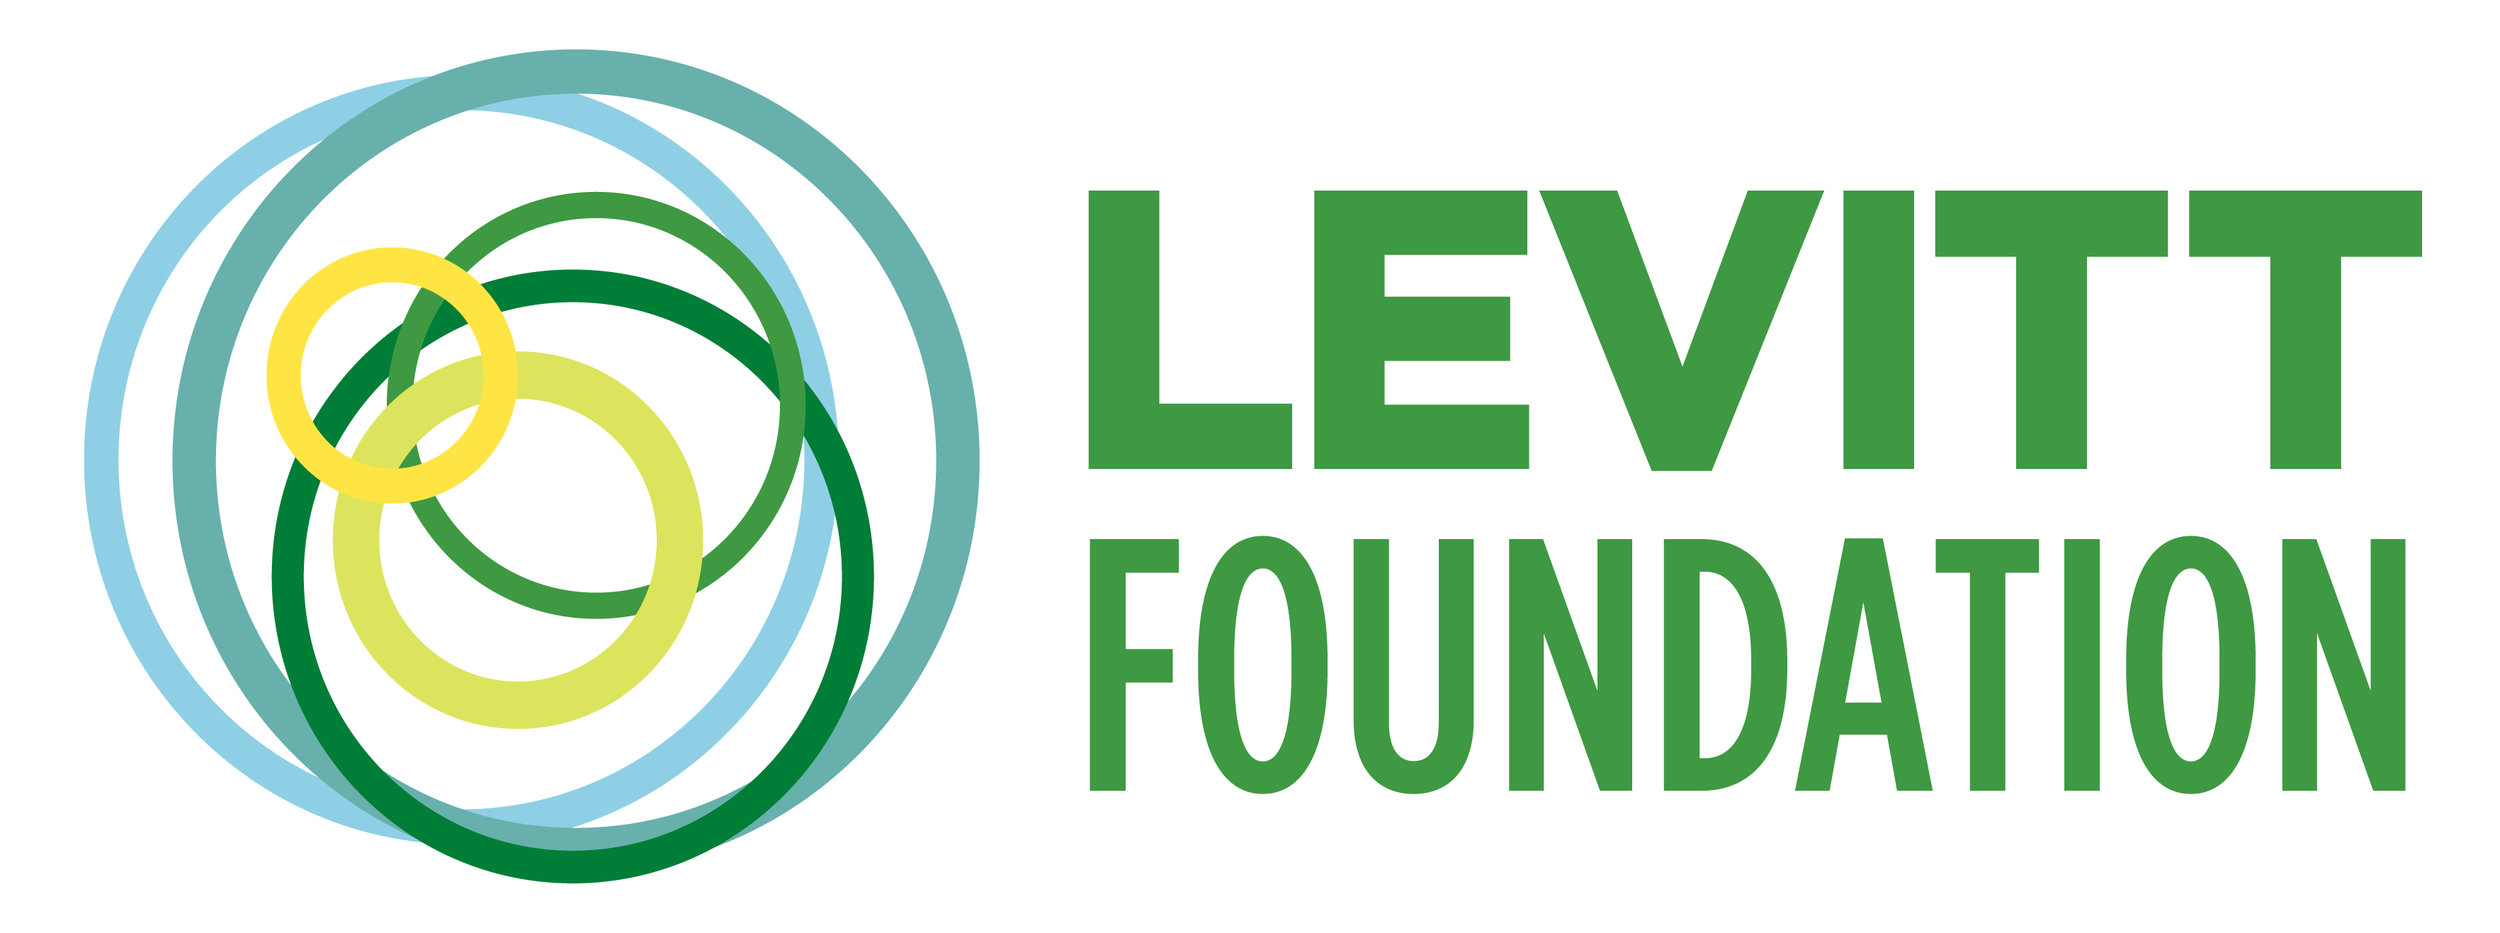 LevittFdn_Logo_Horizontal_RGB.jpg